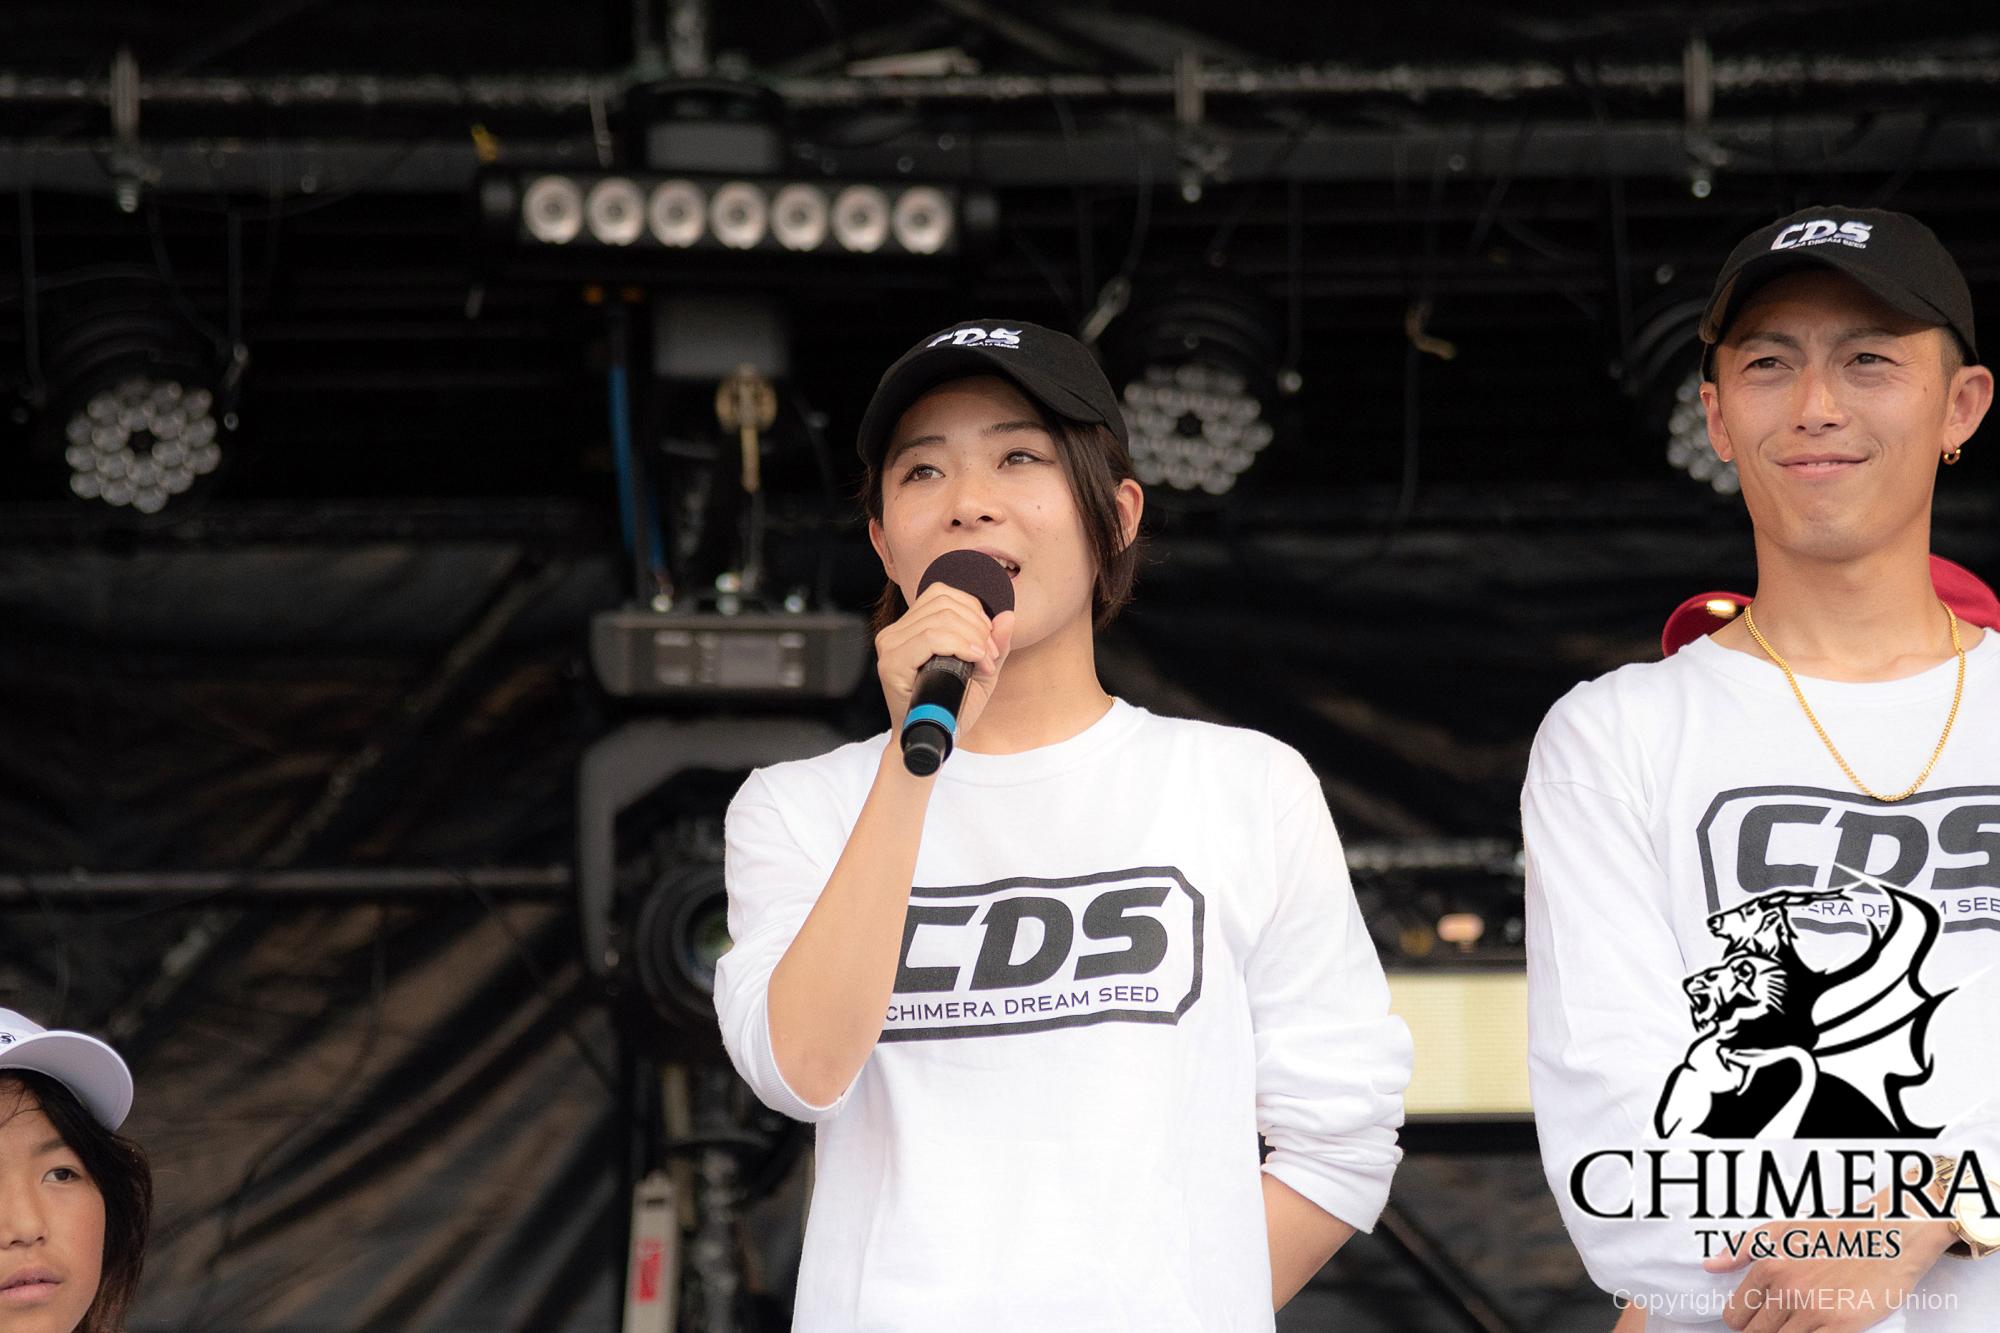 CHIMERA DREAM SEED-東千尋